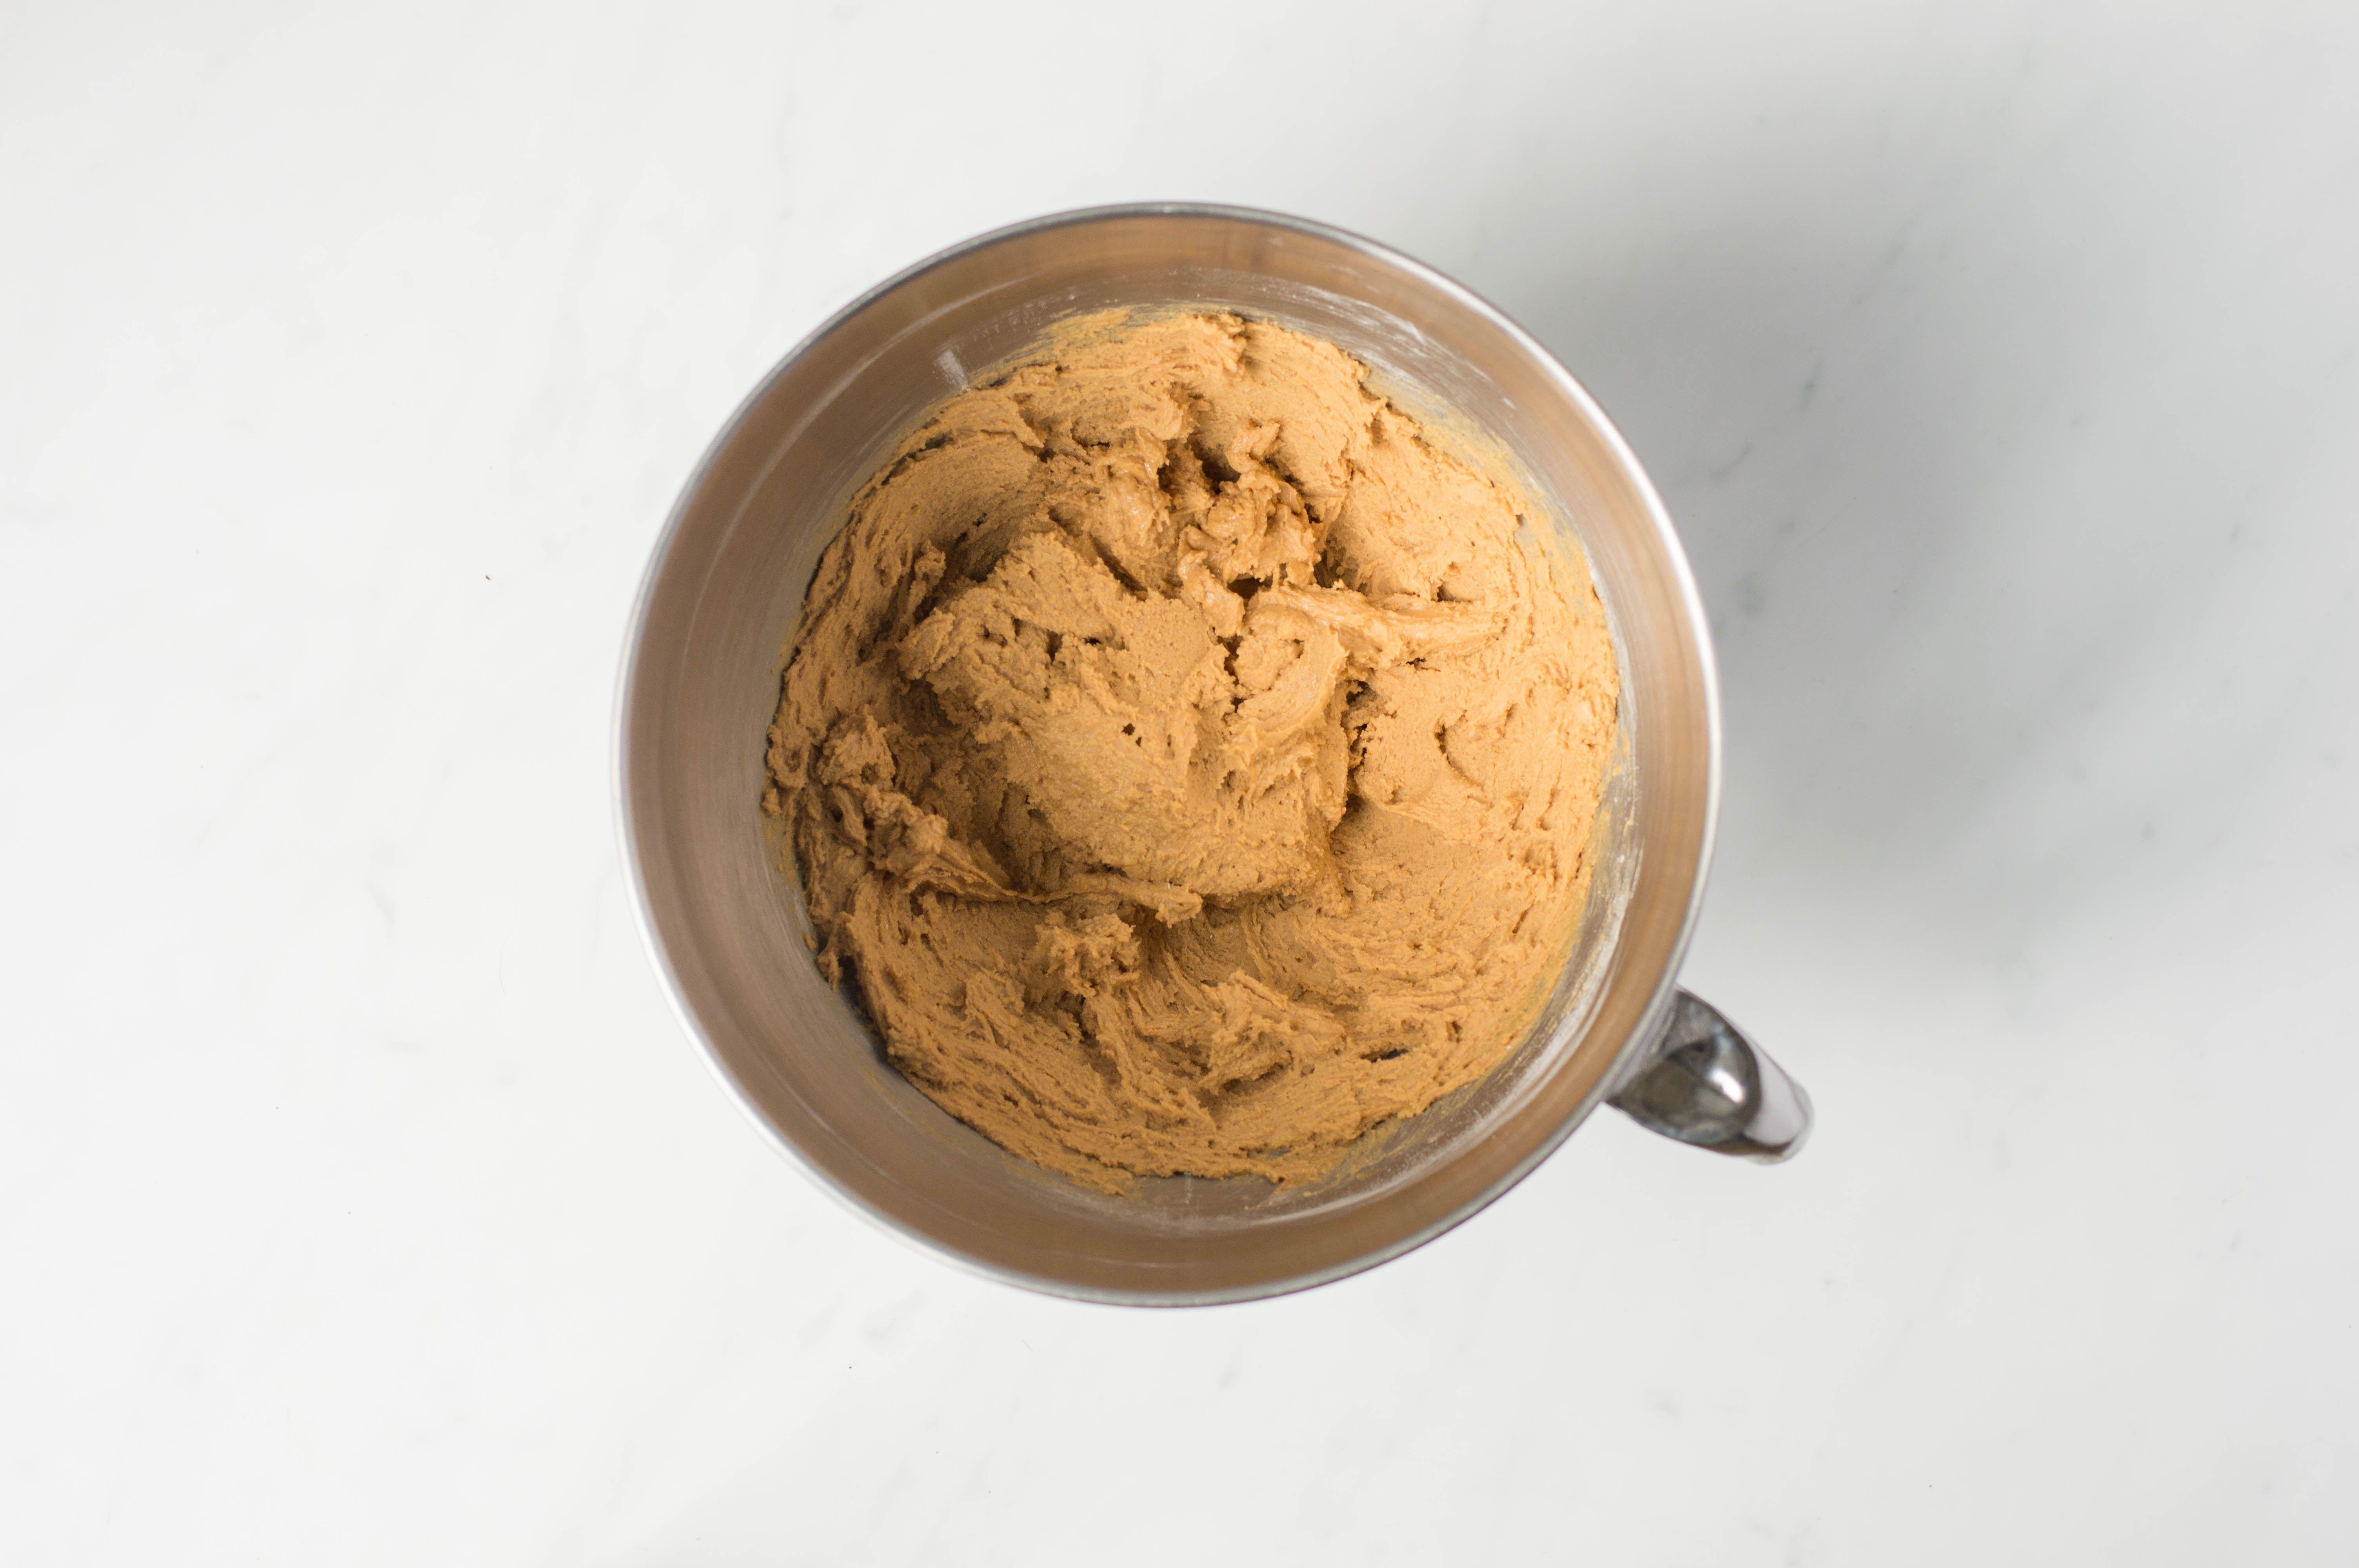 Add vanilla and powdered sugar